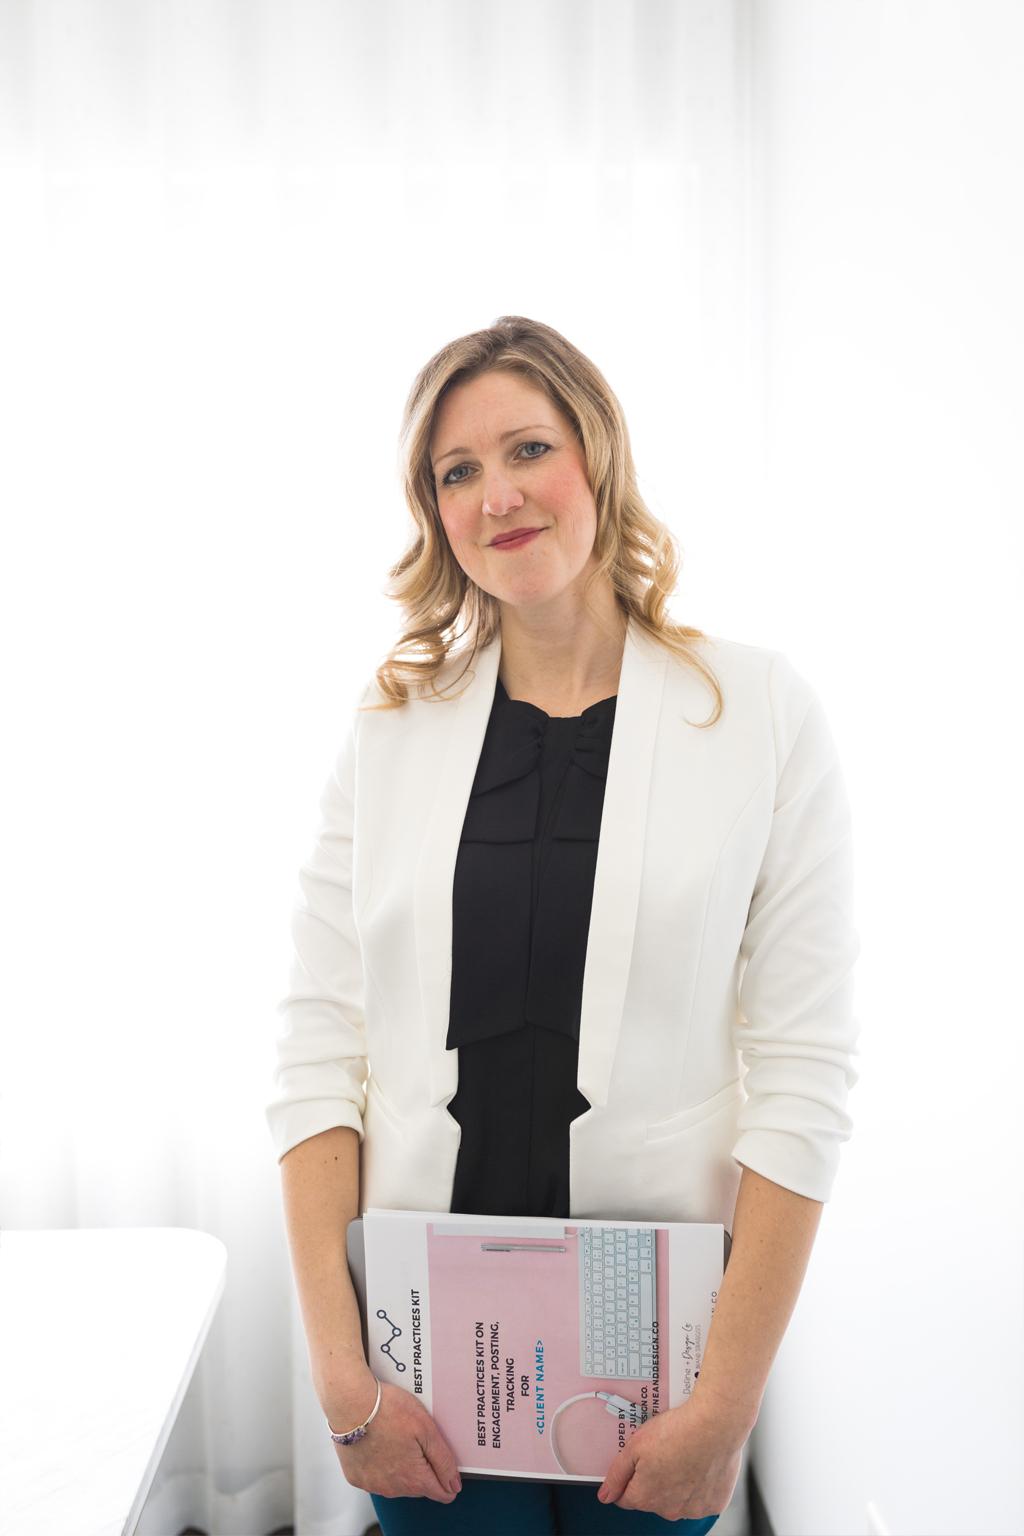 Melissa Macfarlane Heidmiller